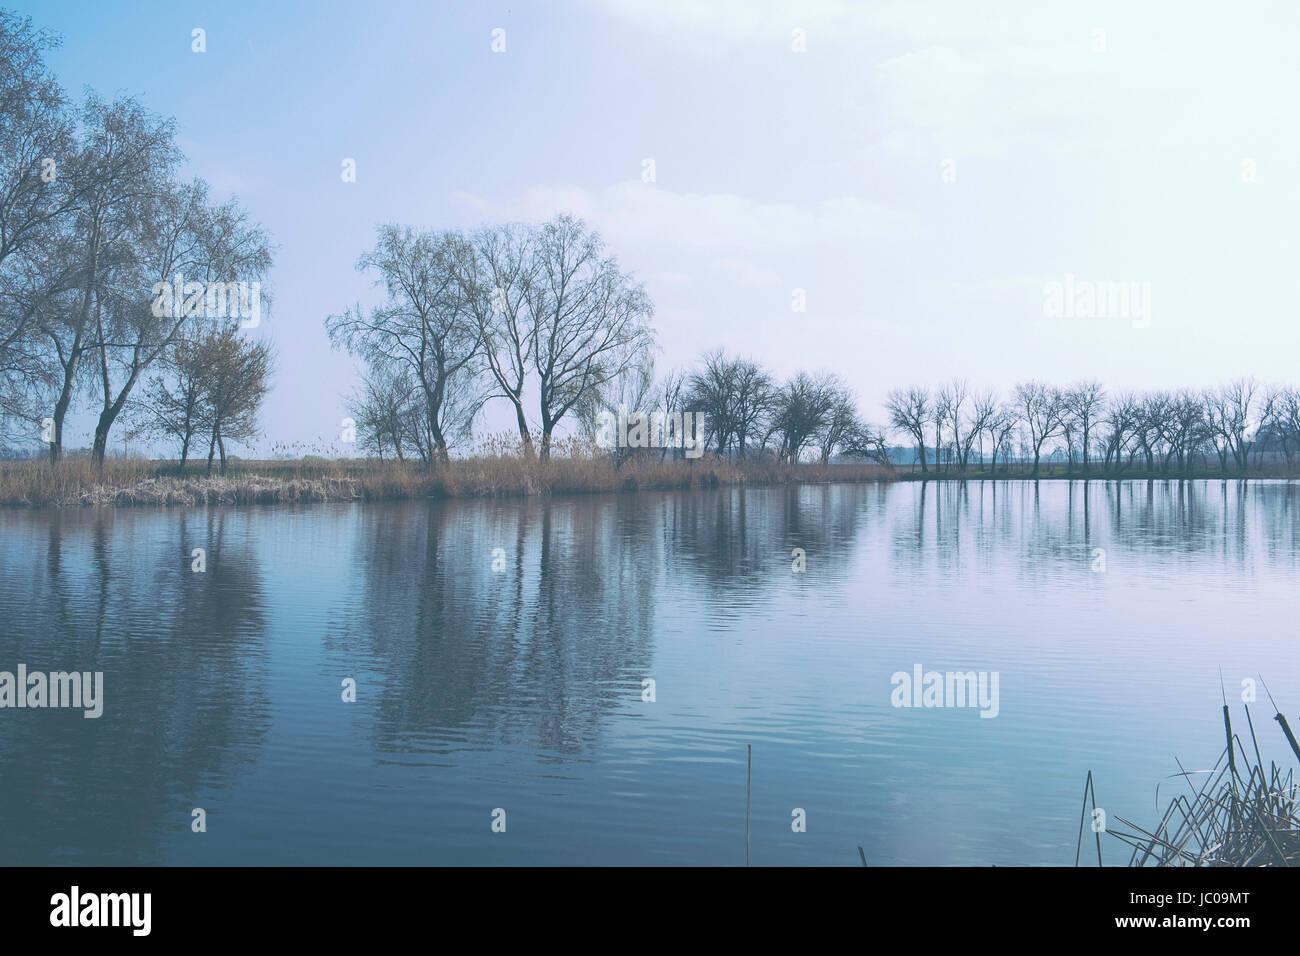 Sieht aus wie Film Foto Natur Szene Stockbild